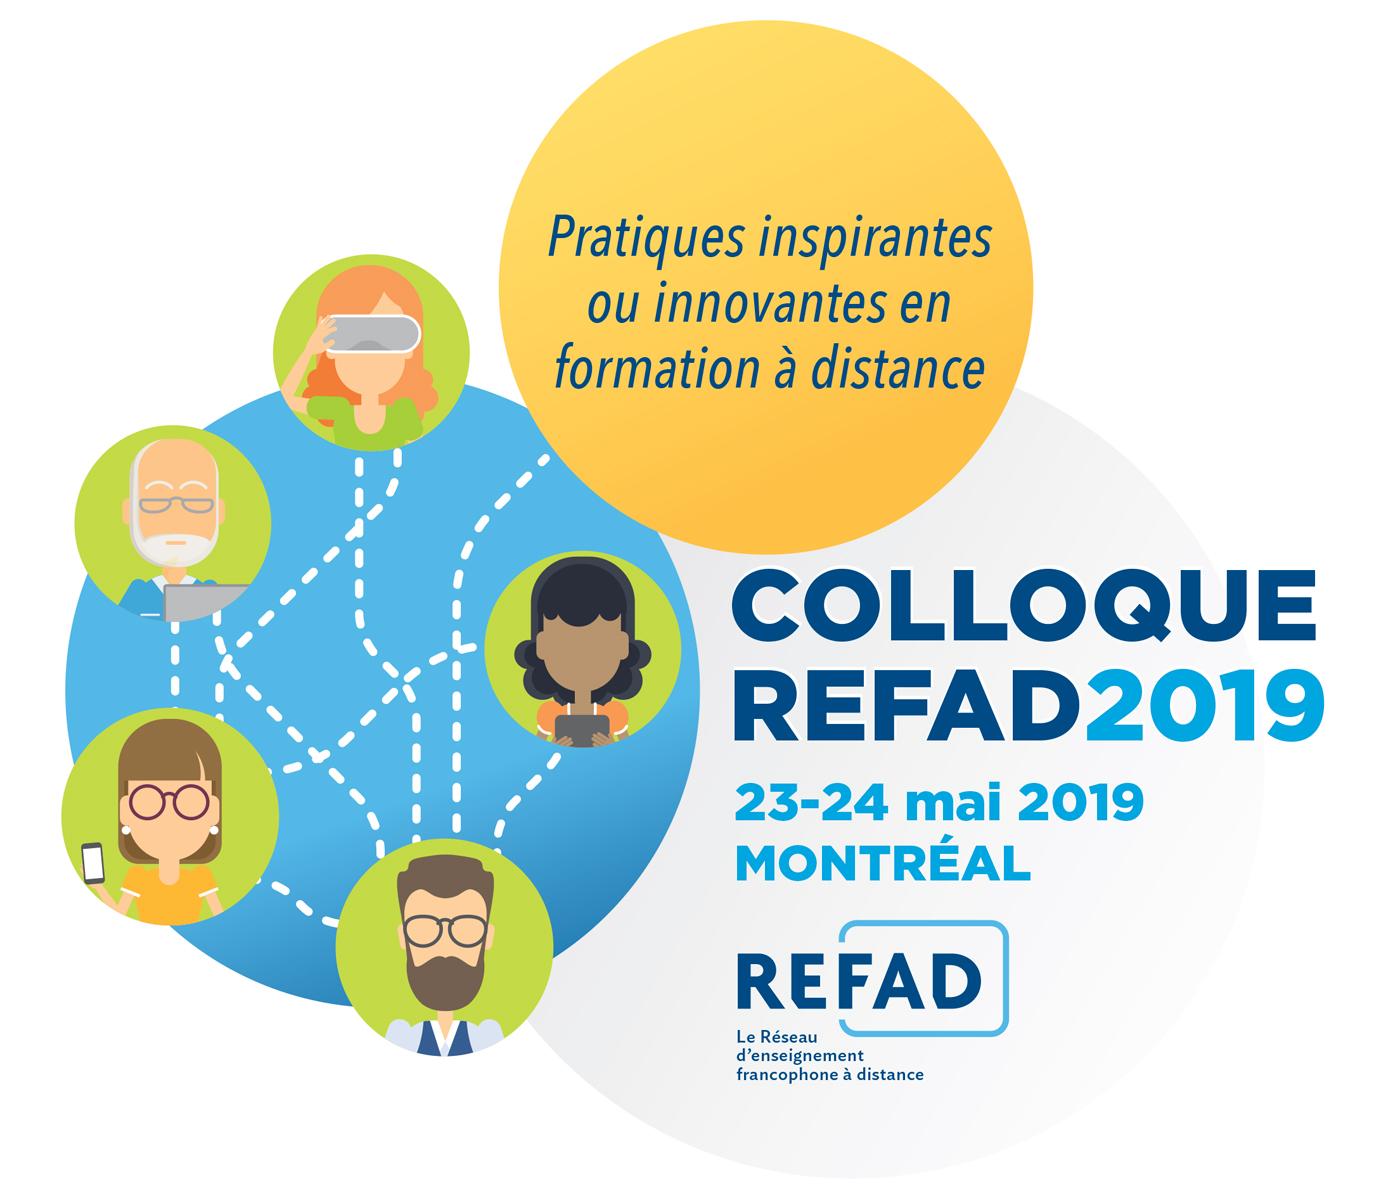 colloque-refad-2019